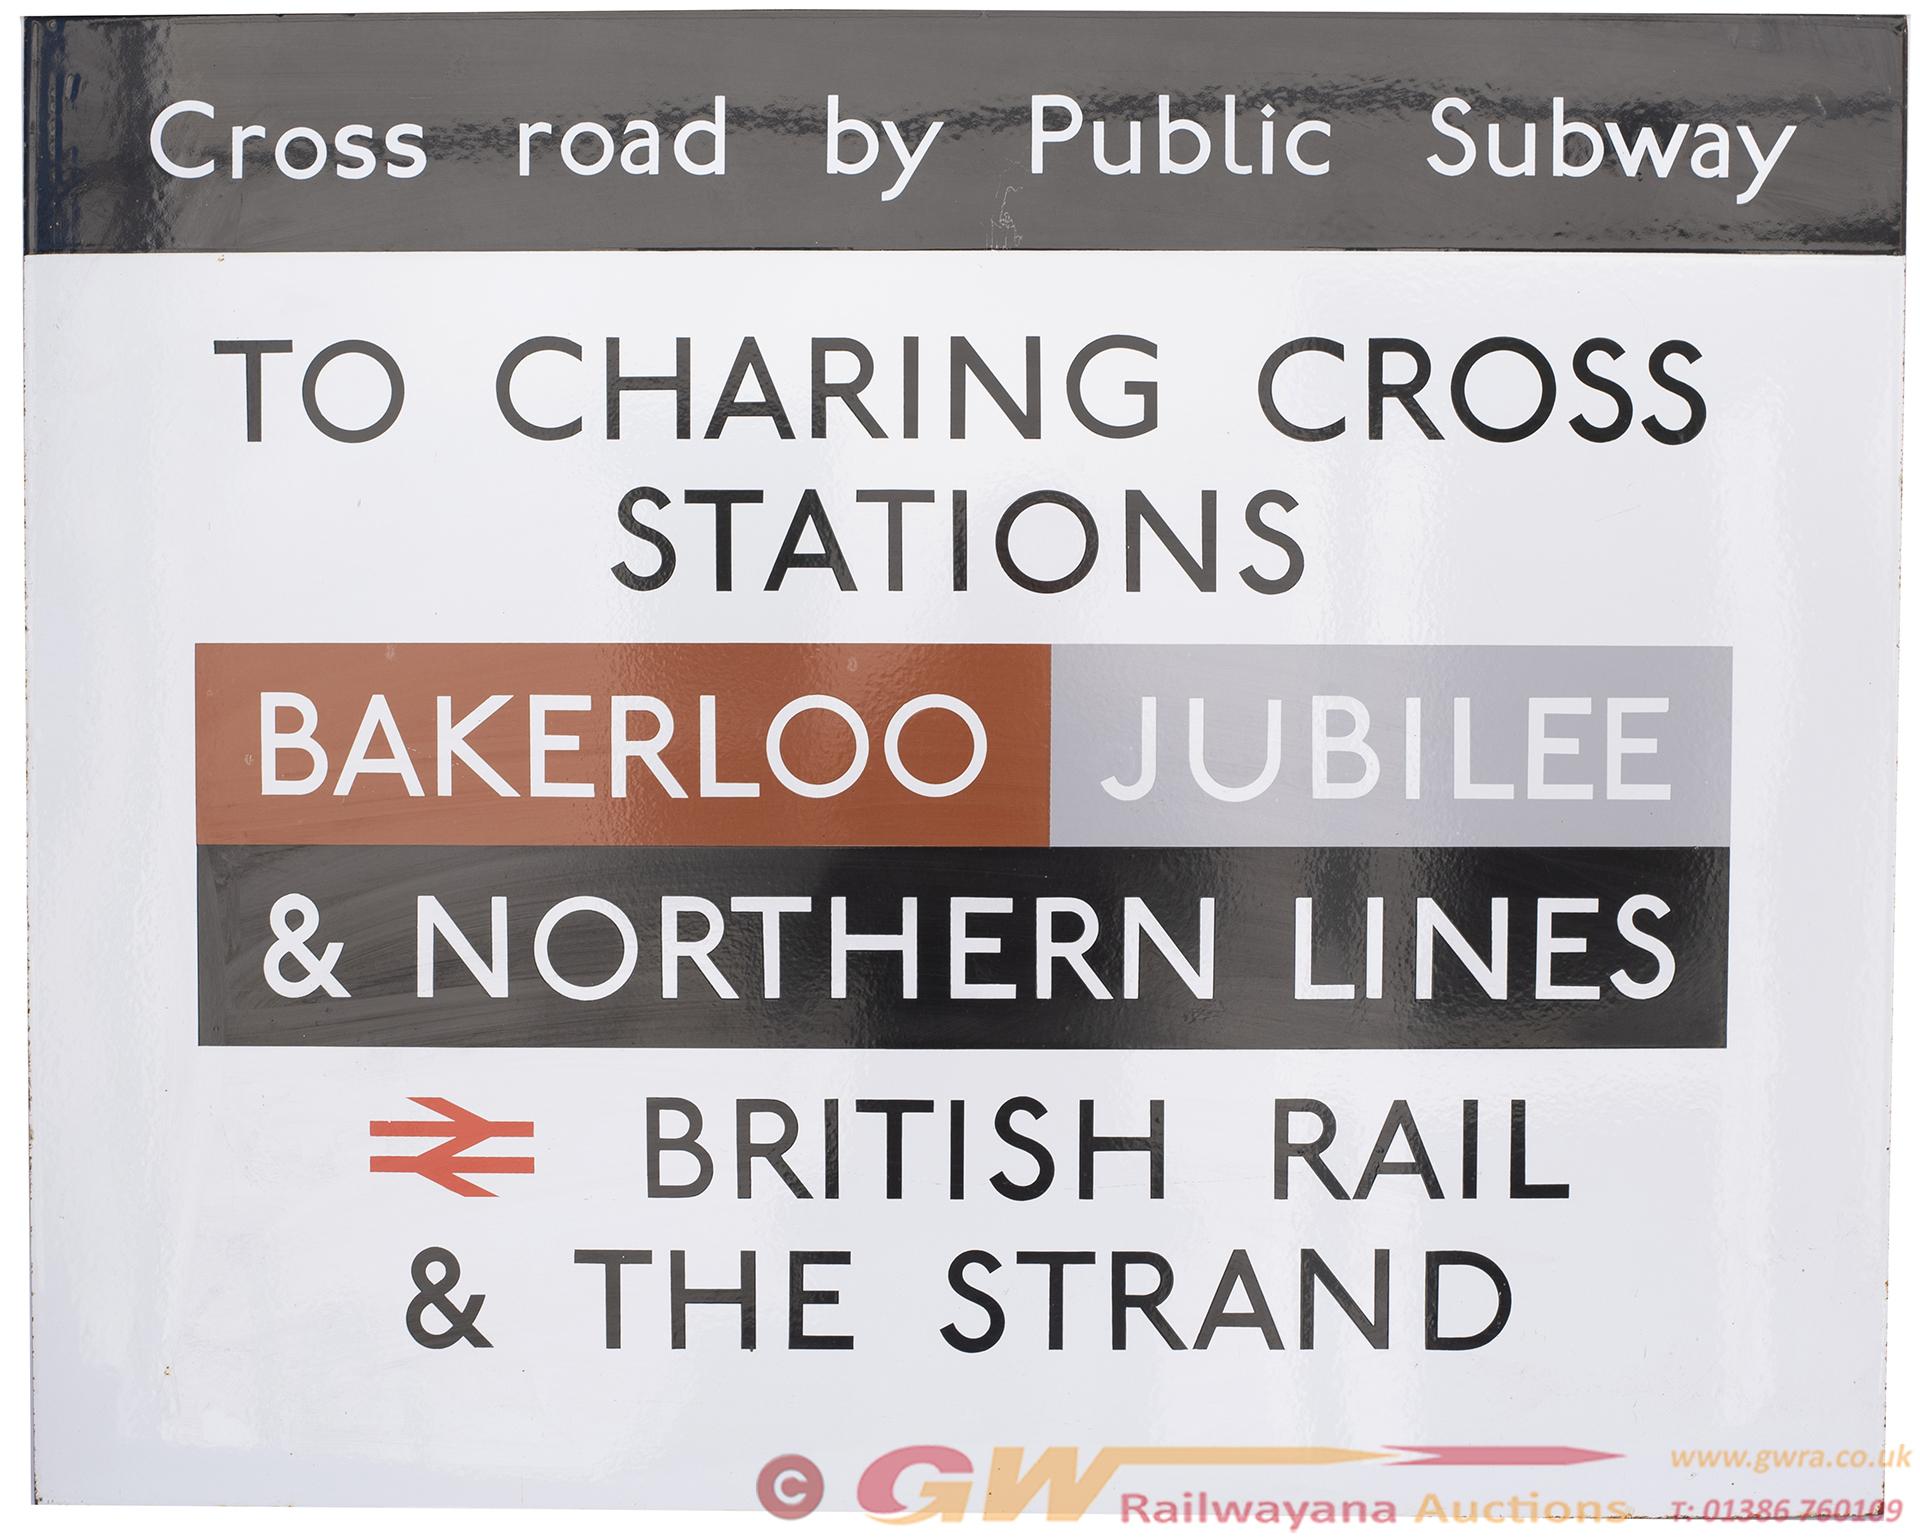 London Transport Underground Enamel Sign CROSS